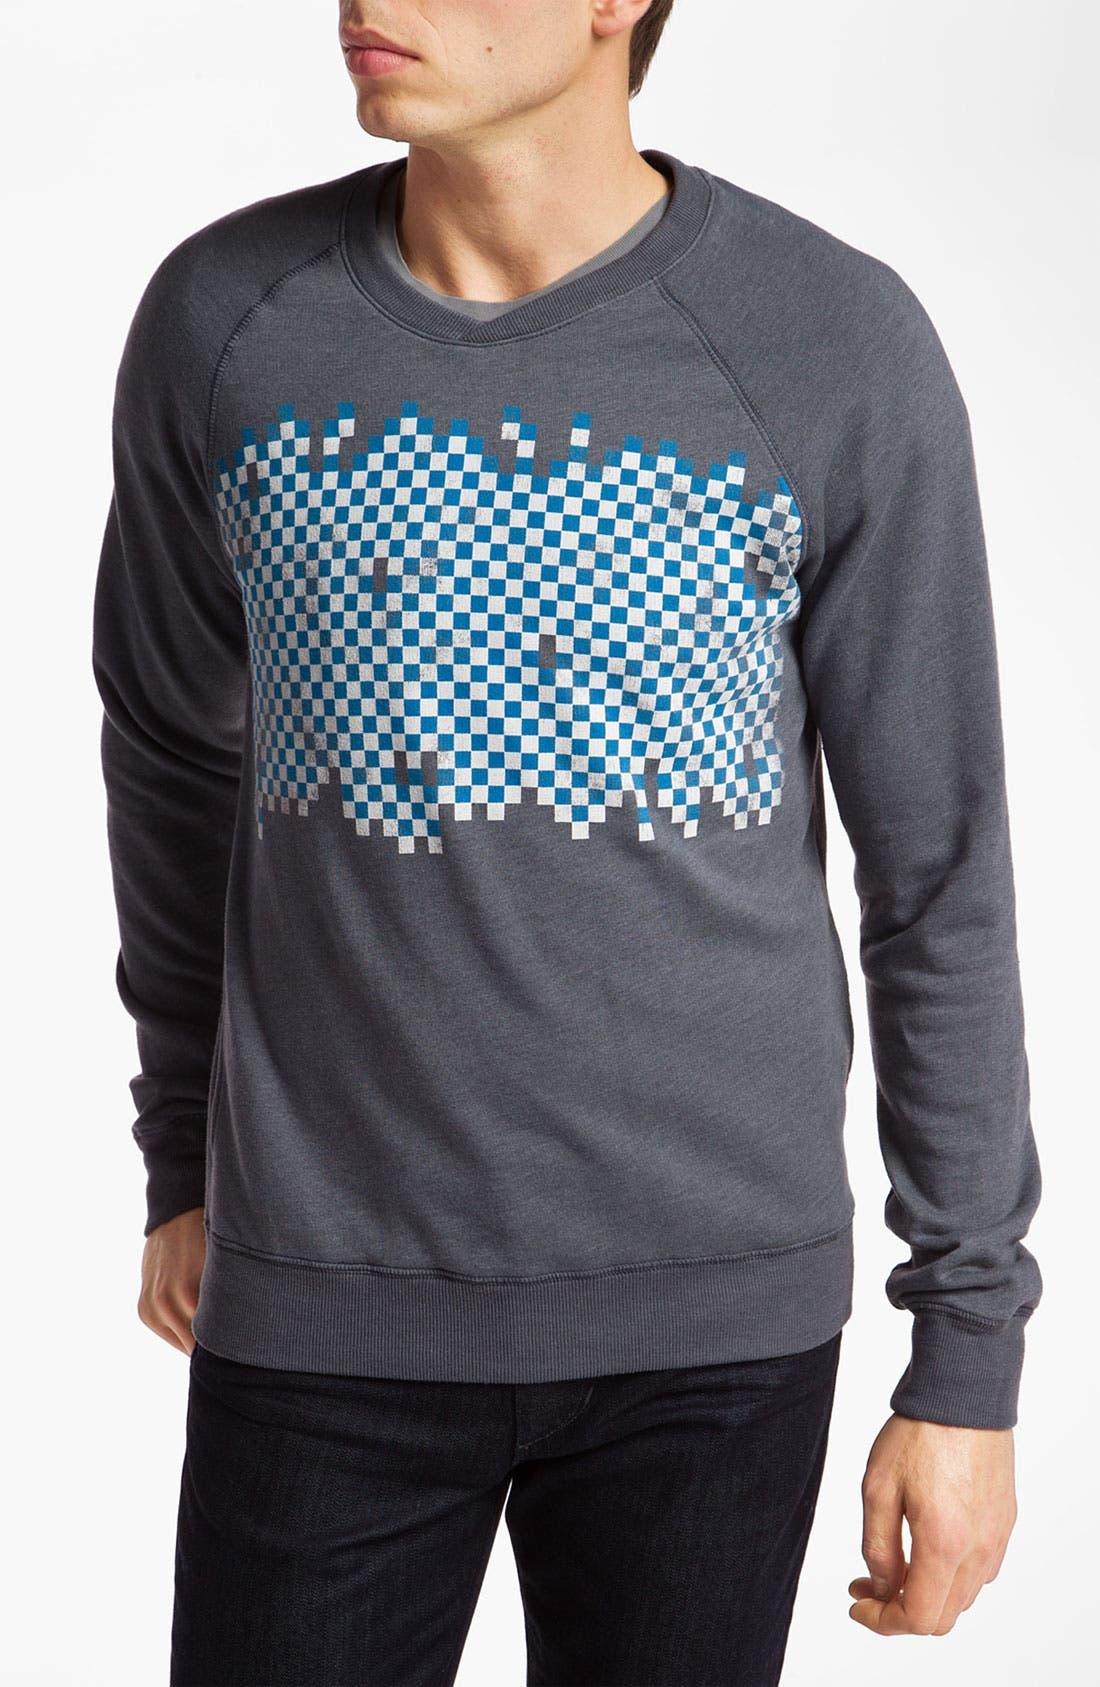 Alternate Image 1 Selected - Topo Ranch 'Check' Crewneck Sweatshirt